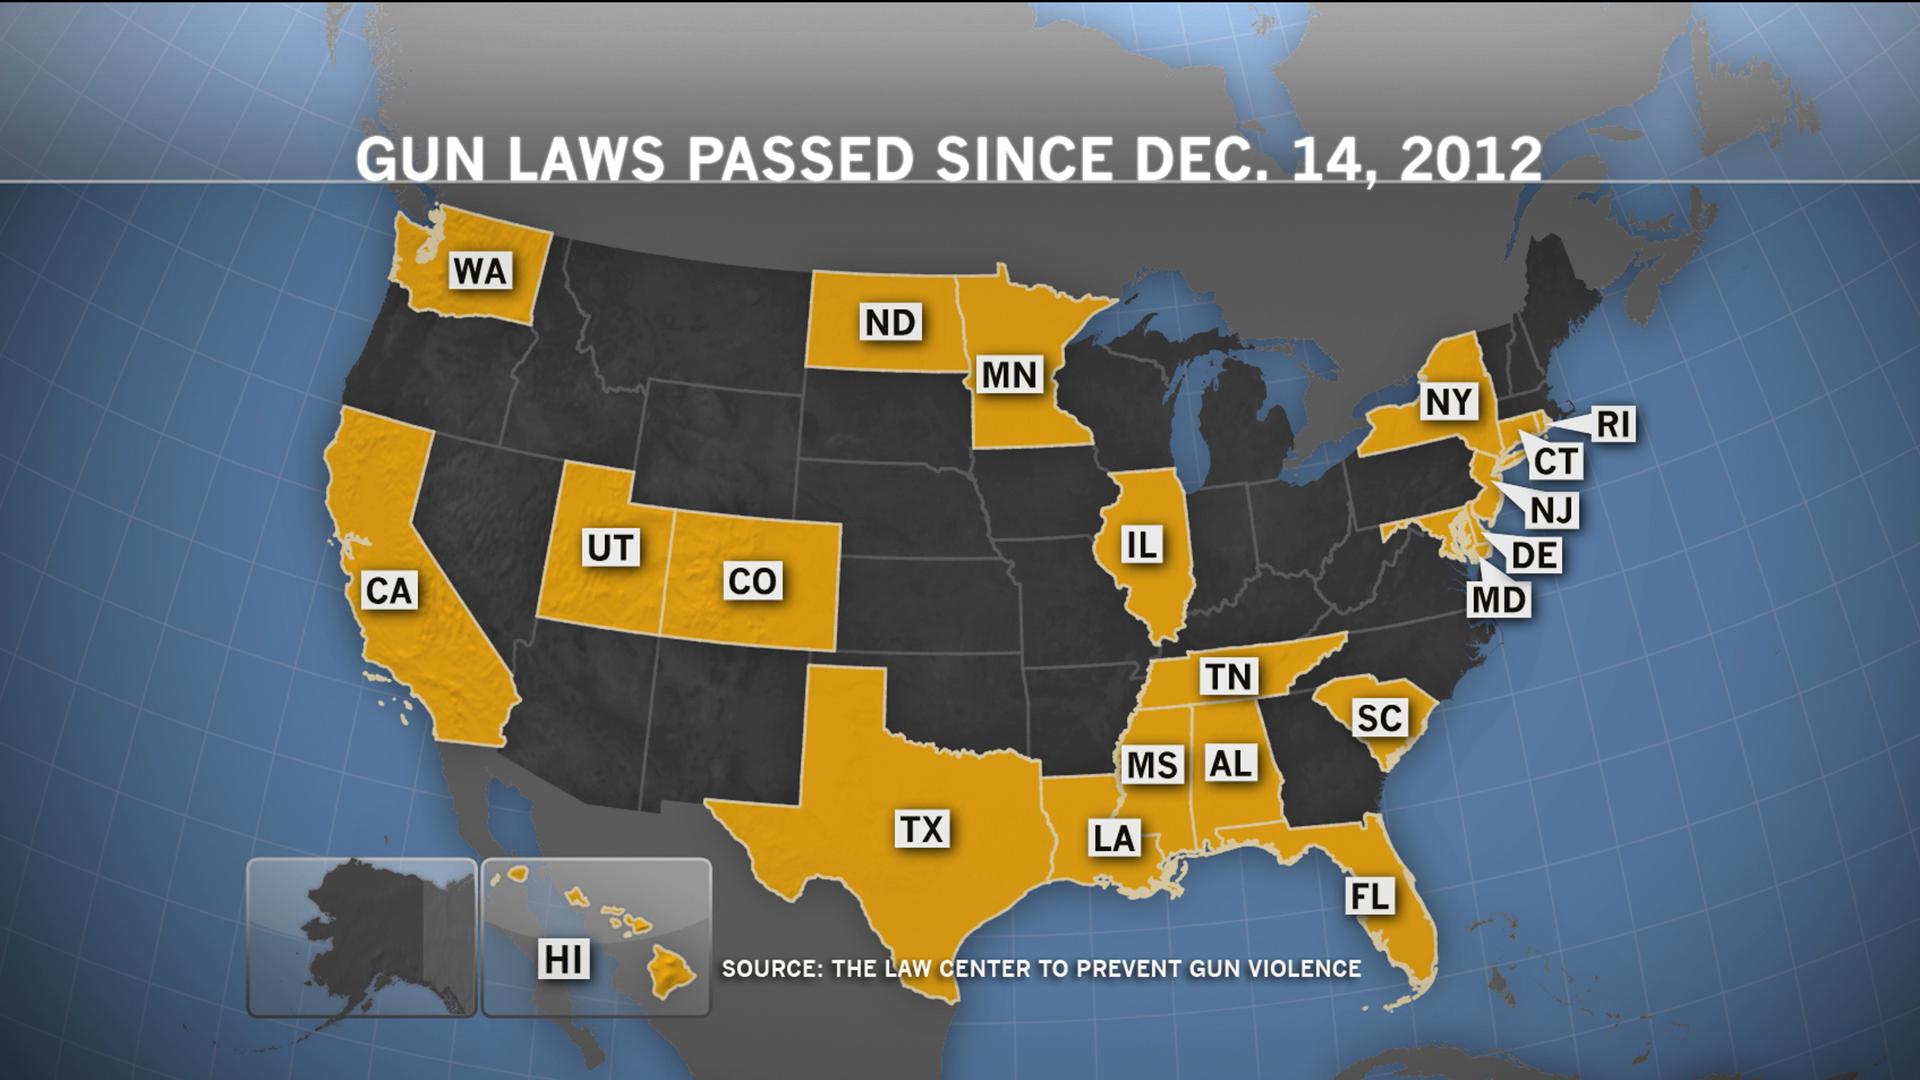 The politics against gun control